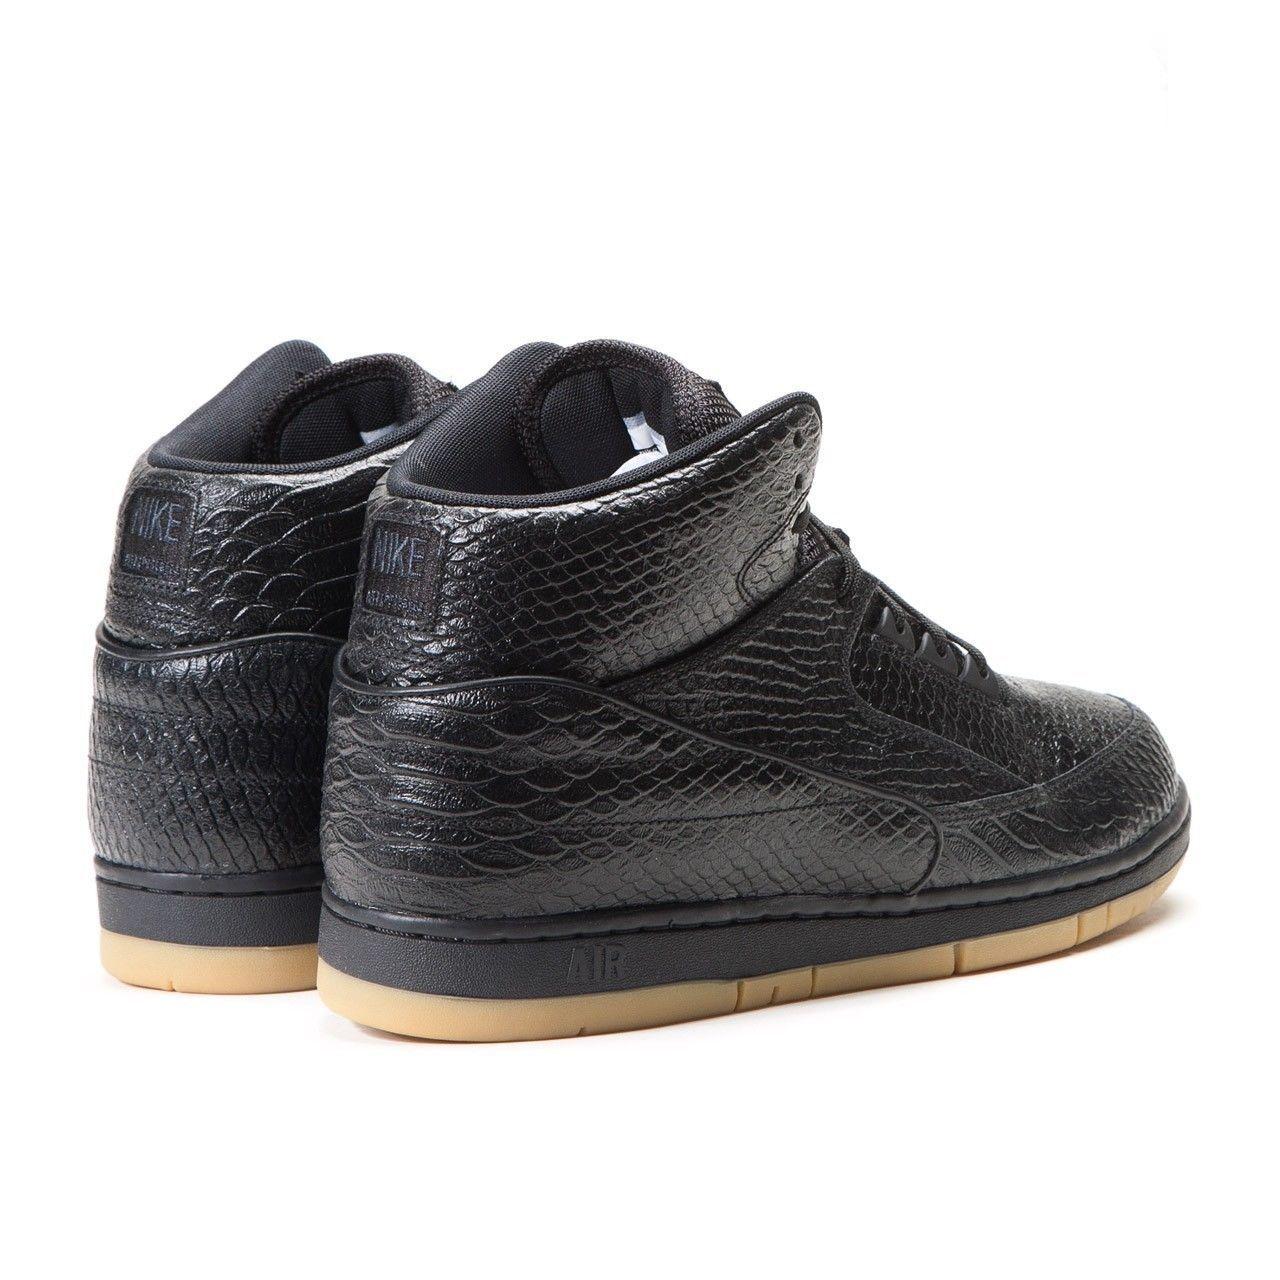 new arrival 85105 13f2e Nike Air Python Premium Black Gum Light Brown 705066 001 Mens Size 8.5